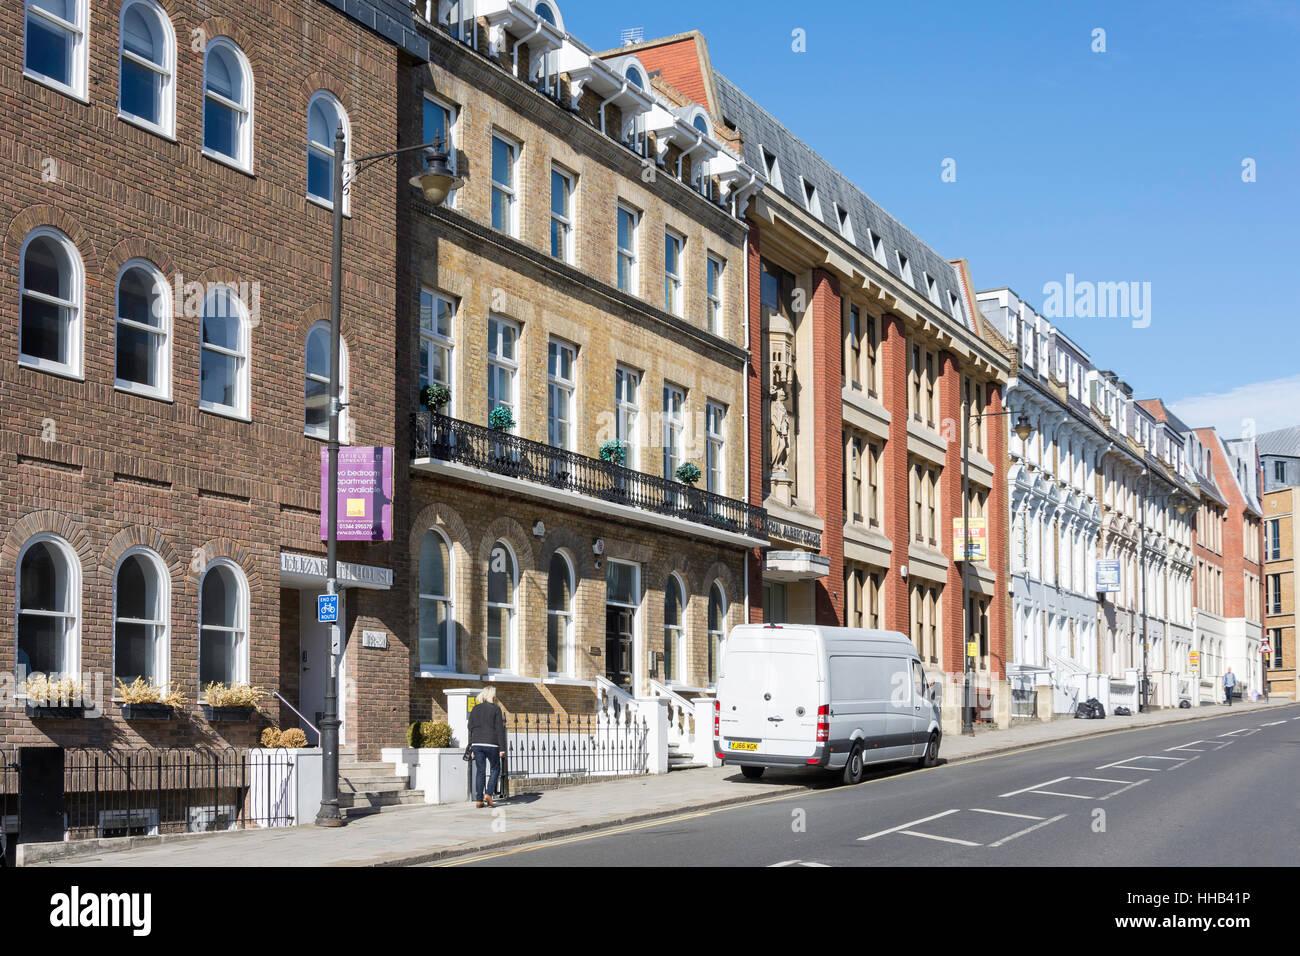 Edificios de época, Hoja Street, Windsor, Berkshire, Inglaterra, Reino Unido Imagen De Stock